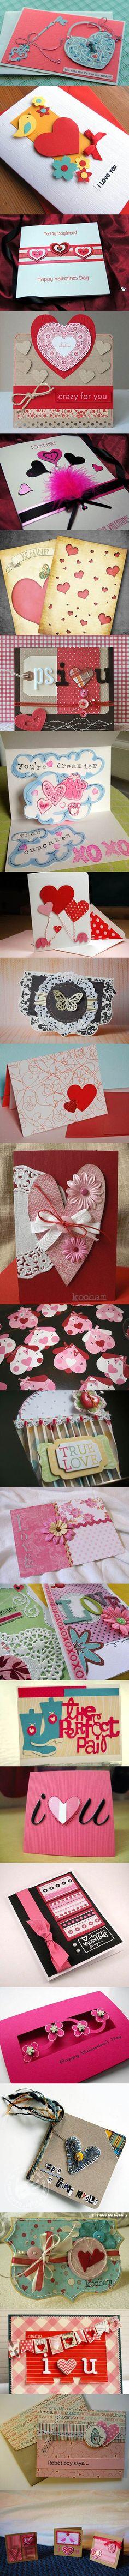 25 Valentine's Day Card DIY Ideas | iCreativeIdeas.com Like Us on Facebook ==> https://www.facebook.com/icreativeideas